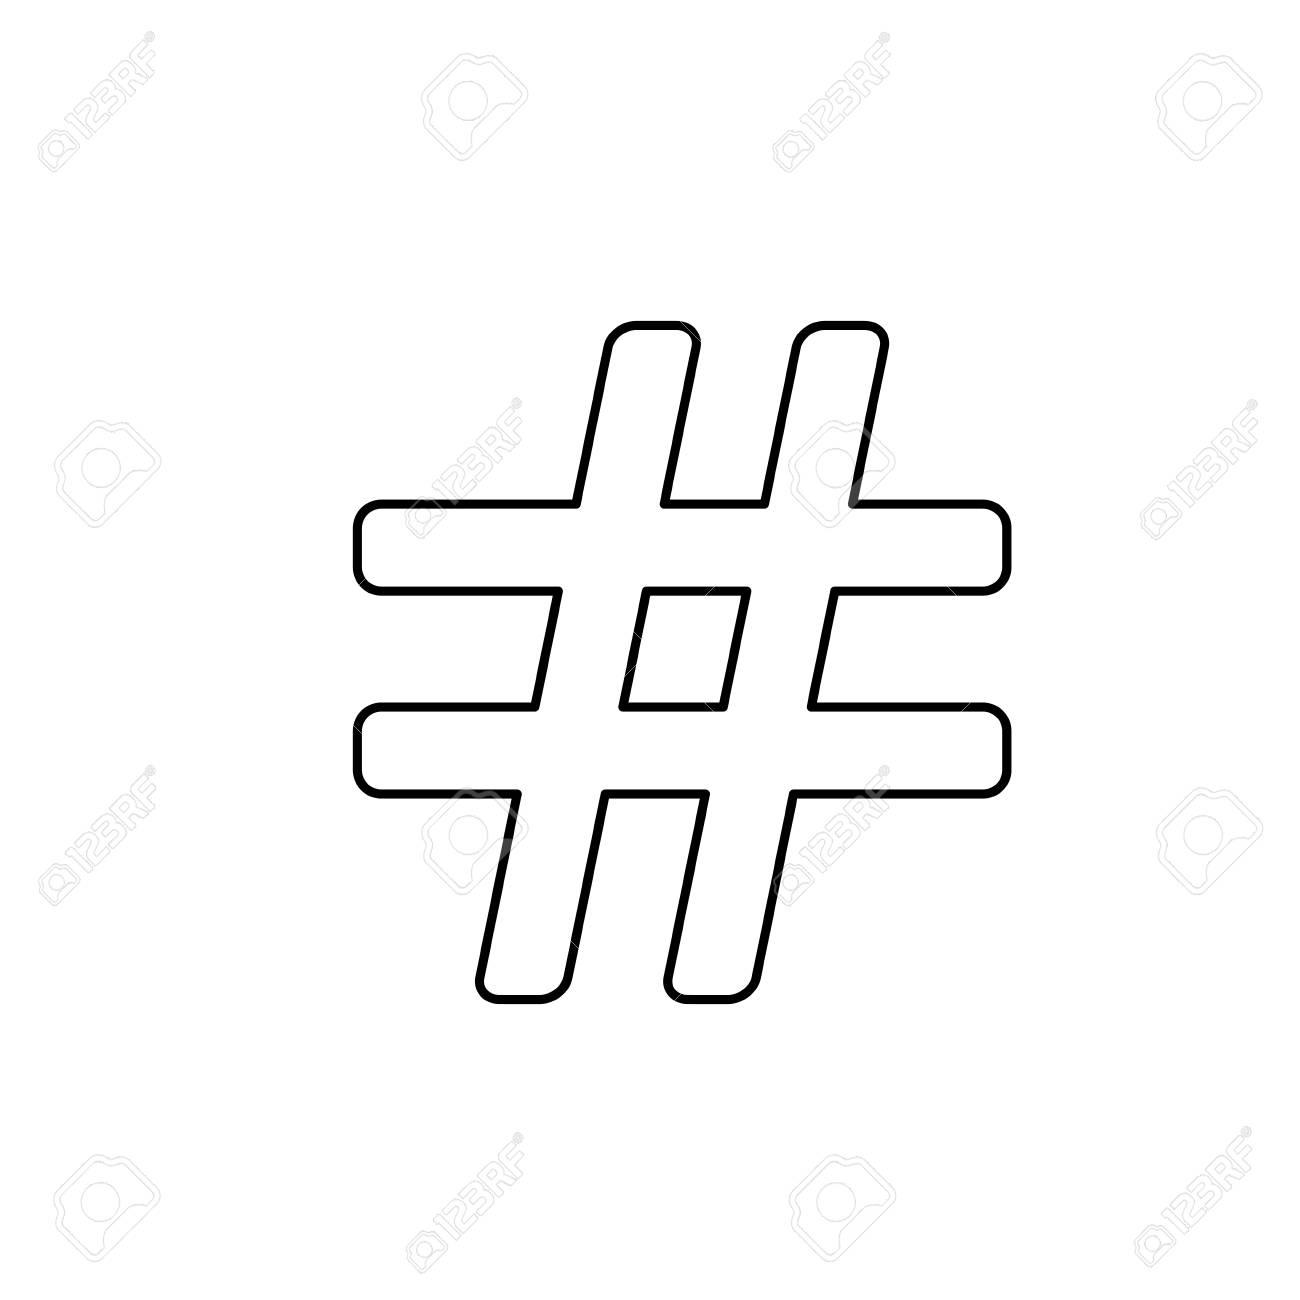 Line Numeral Symbol Design Type Icon Royalty Free Cliparts Vectors